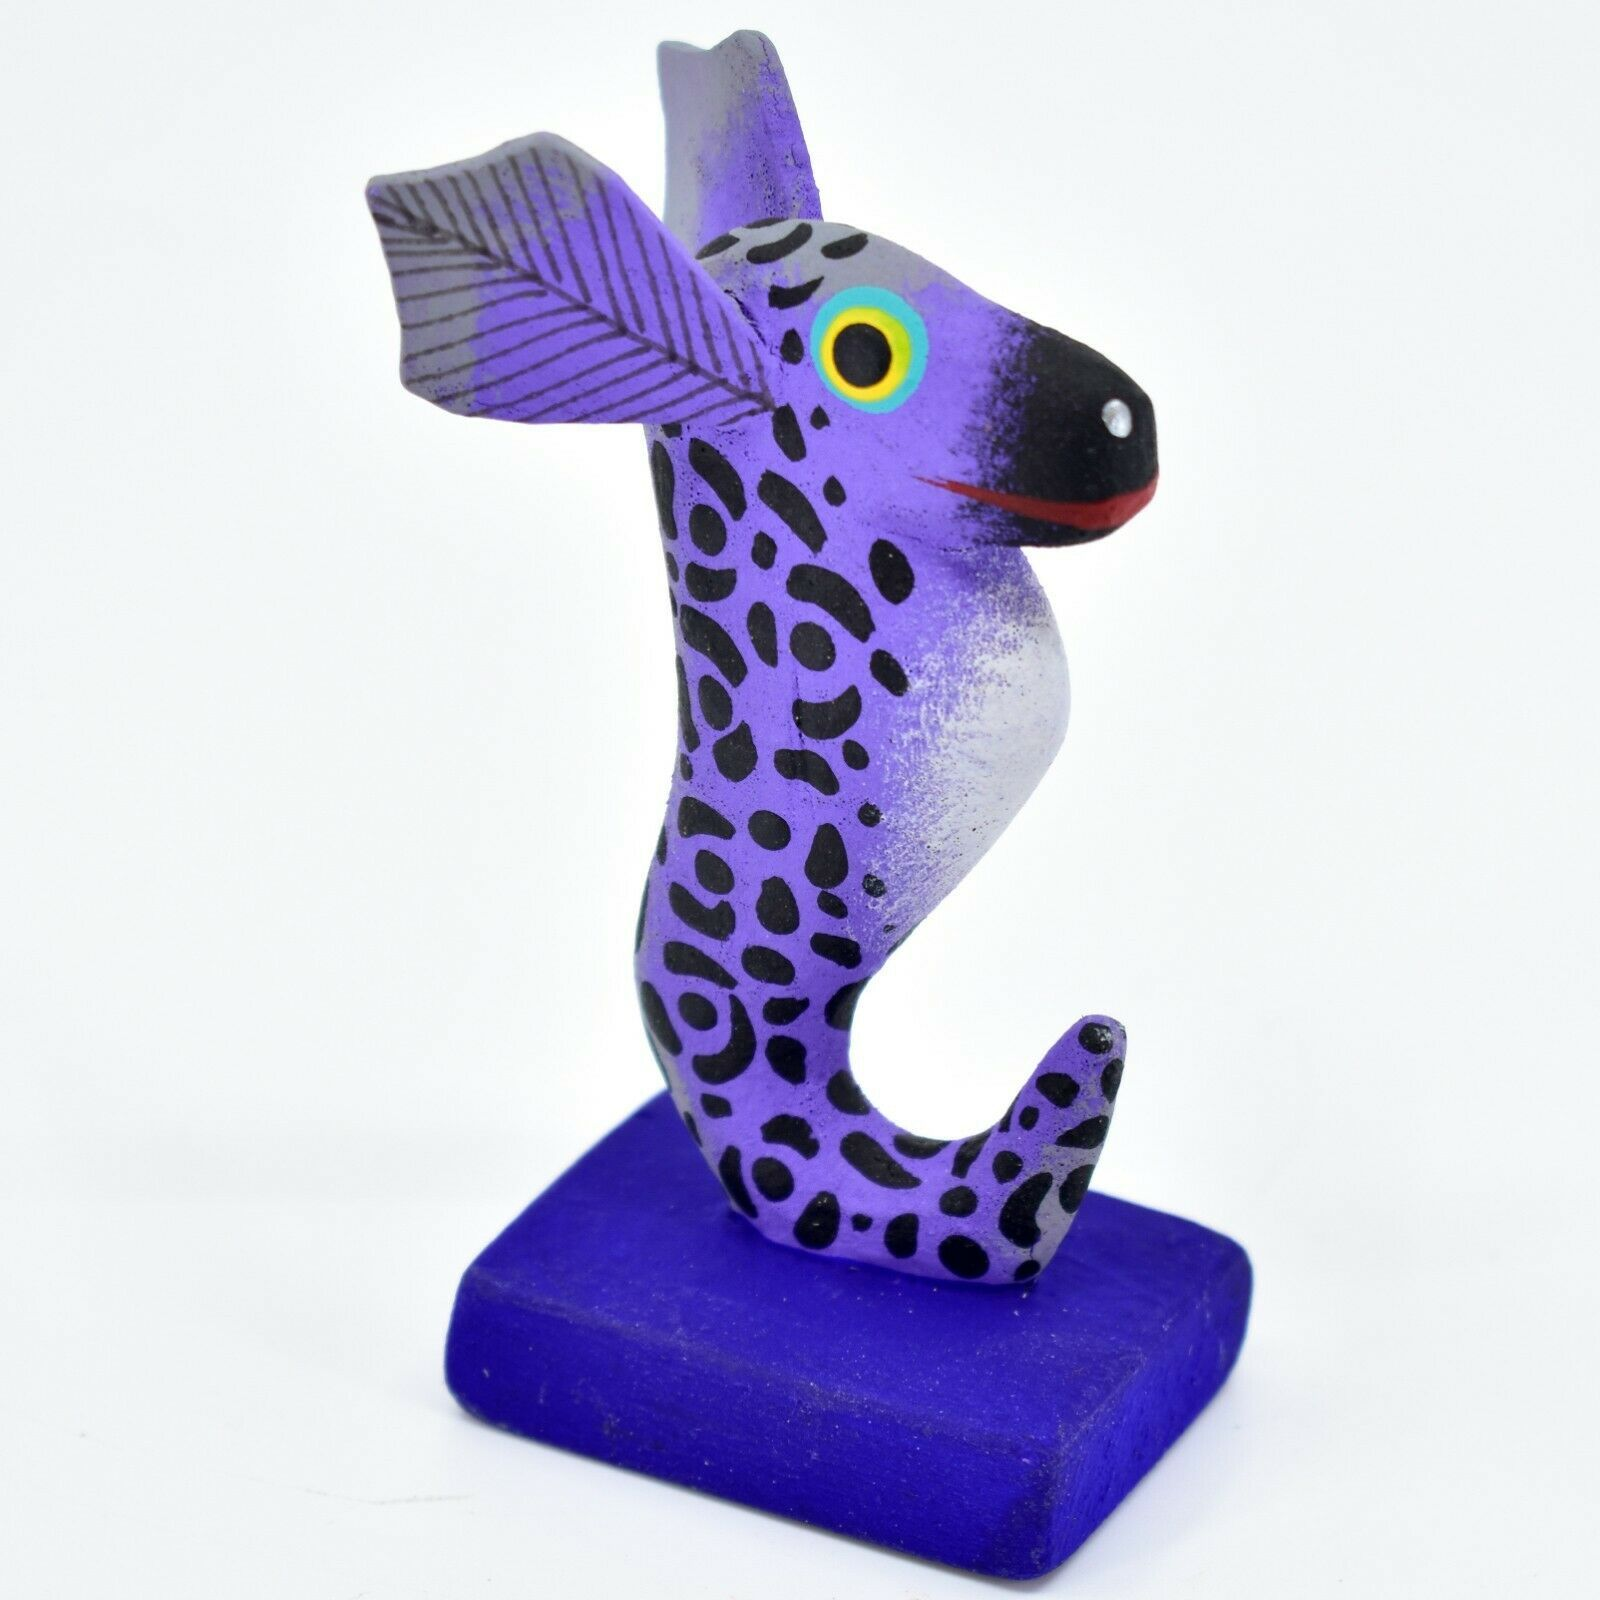 Handmade Alebrijes Oaxacan Painted Wood Folk Art Zebra Striped Seahorse Figurine